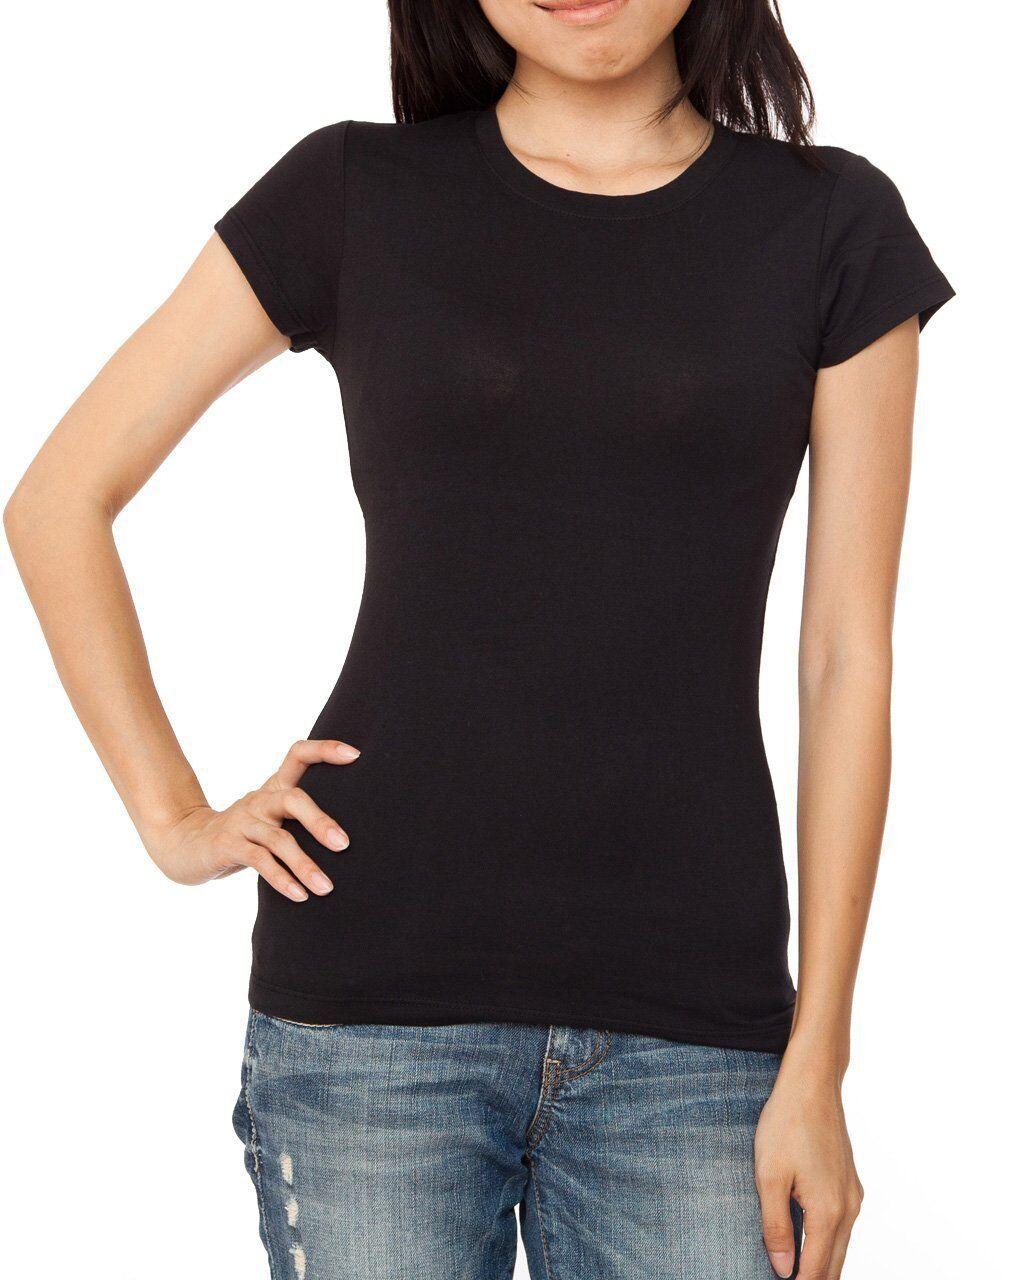 New women 39 s girls plain t shirt crew neck summer t shirt for Plain white tee shirt womens